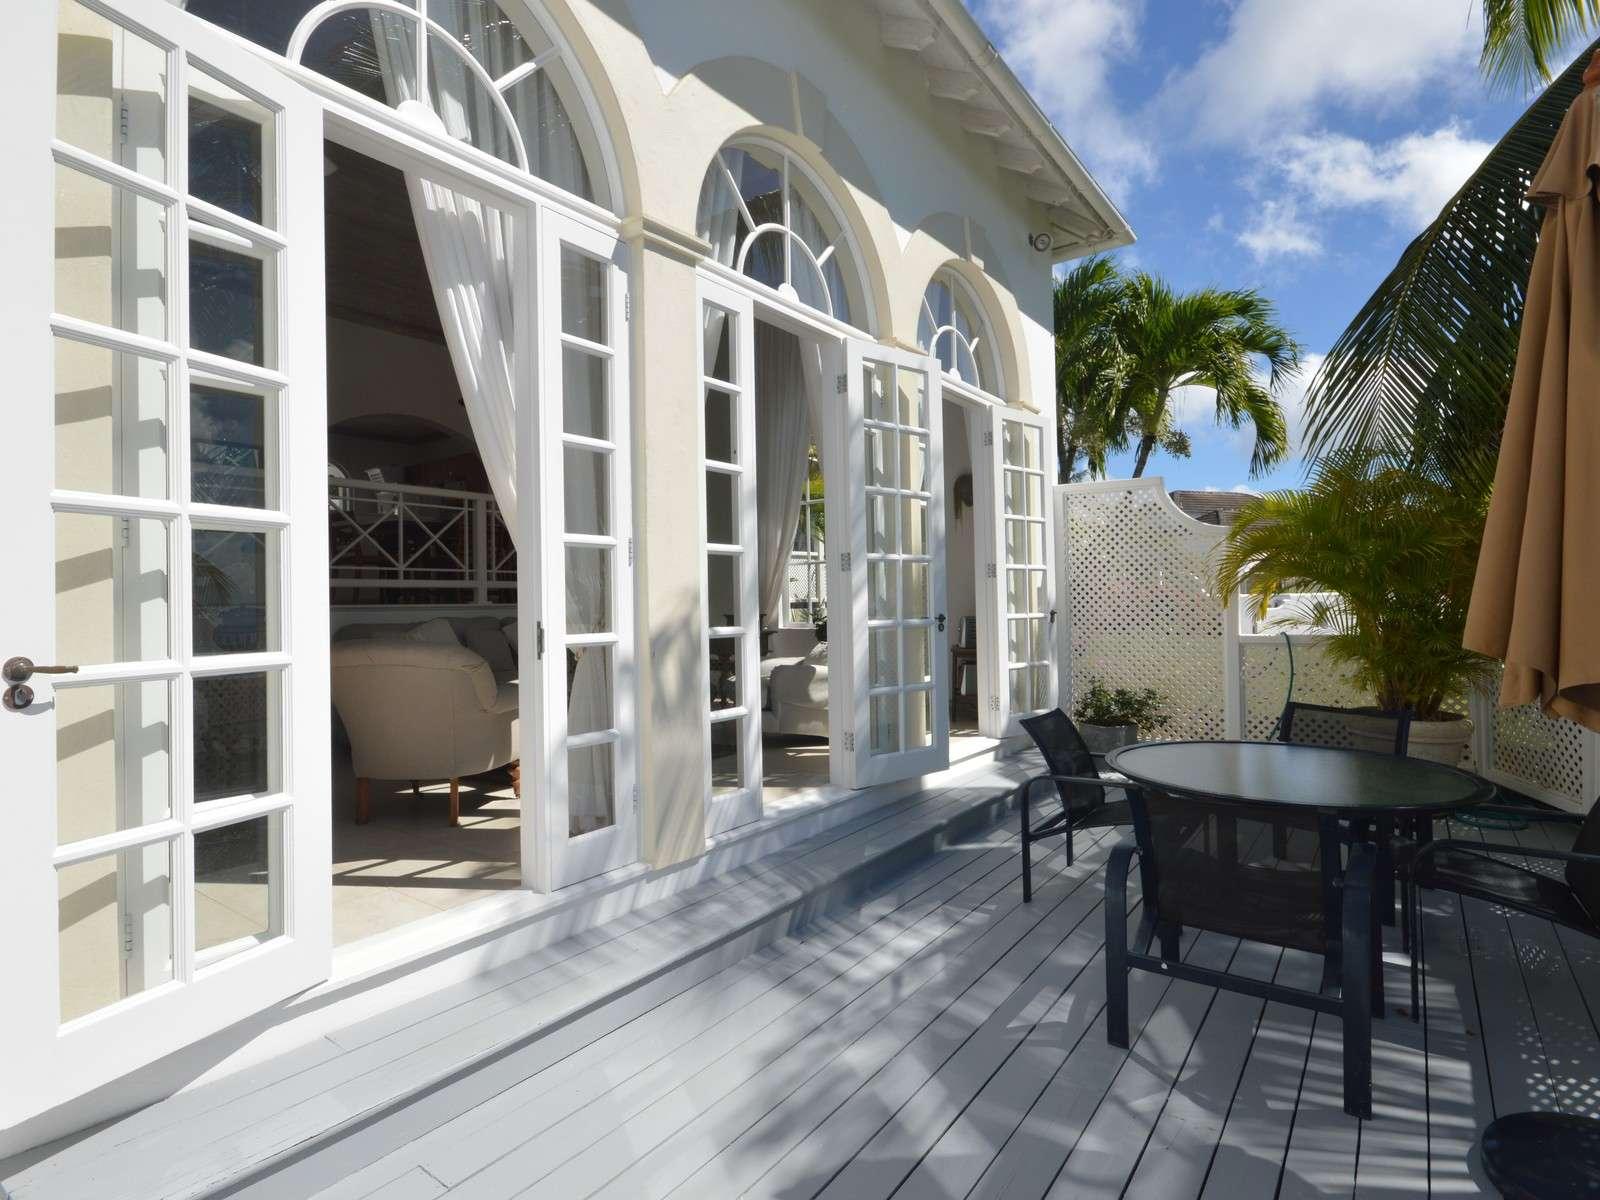 Luxury villa rentals caribbean - Barbados - St james - Royal westmoreland golf resort - Cassia Heights 27 - Image 1/20